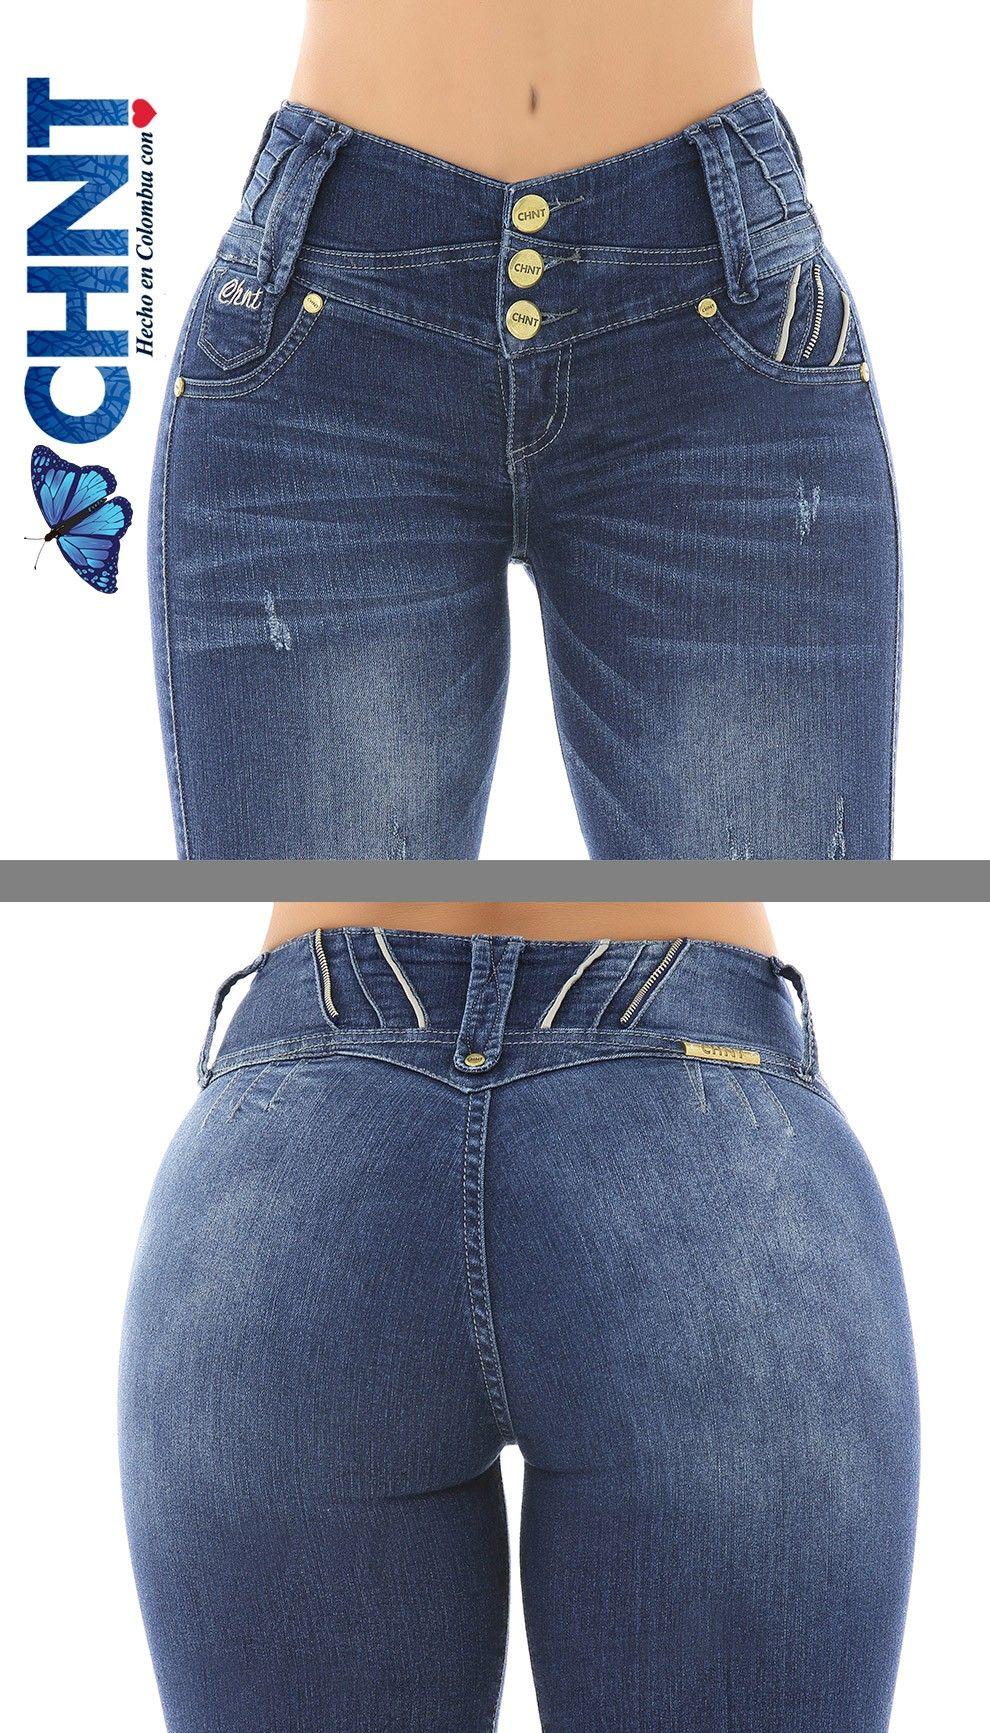 Colombian Fajas Jeans Blue Push Up Butt Lift w Belt Levanta Cola Skinny Molding